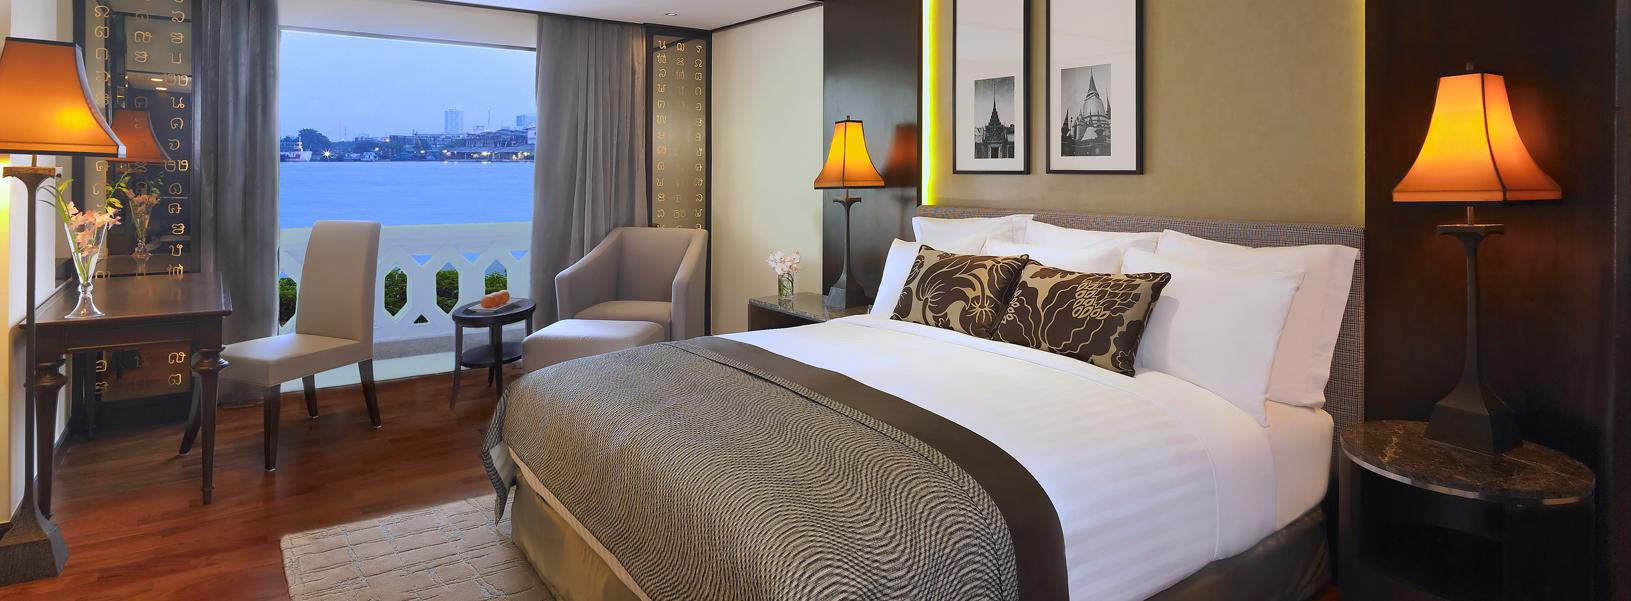 Deluxe_Riverfront_Room_Anantara